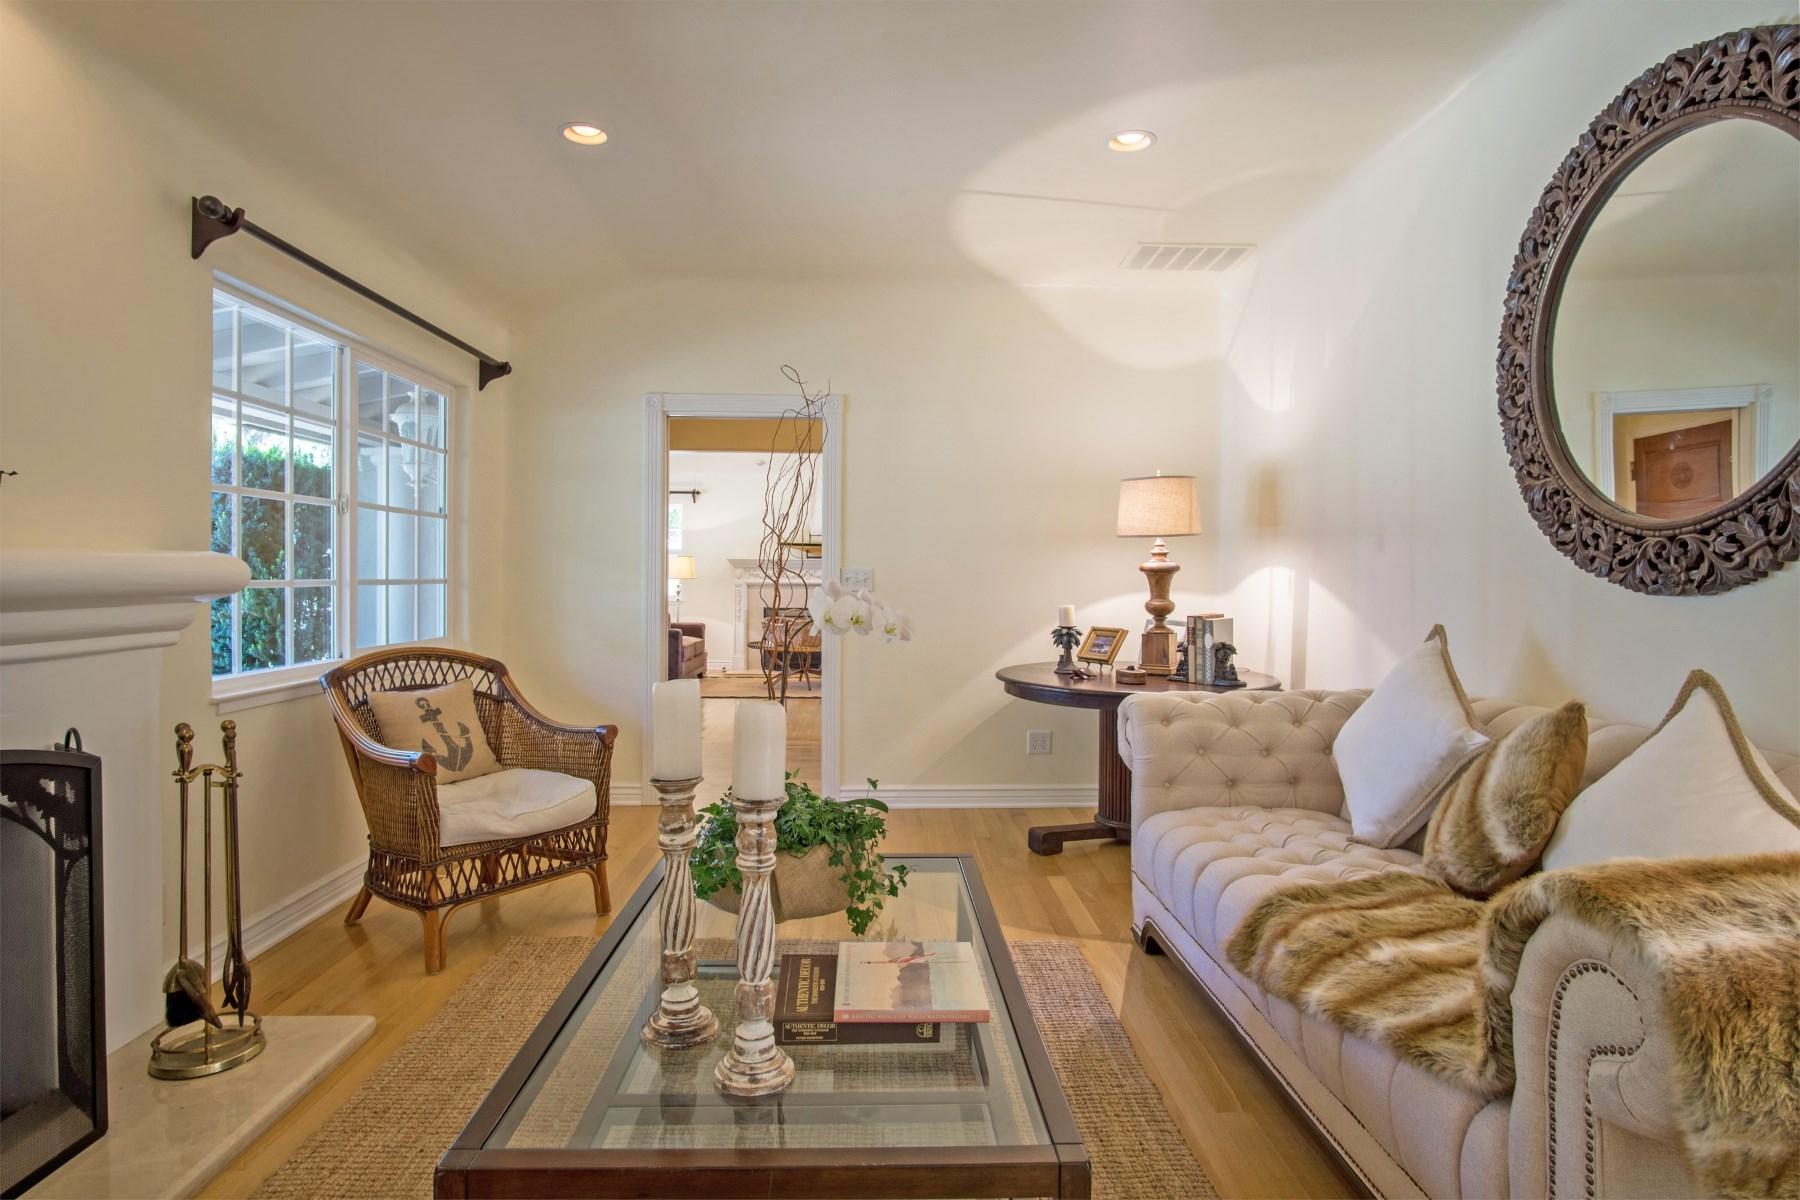 Single Family Home for Sale at Sophisticated in Pebble Beach 1084 Presidio Road Pebble Beach, California, 93953 United States